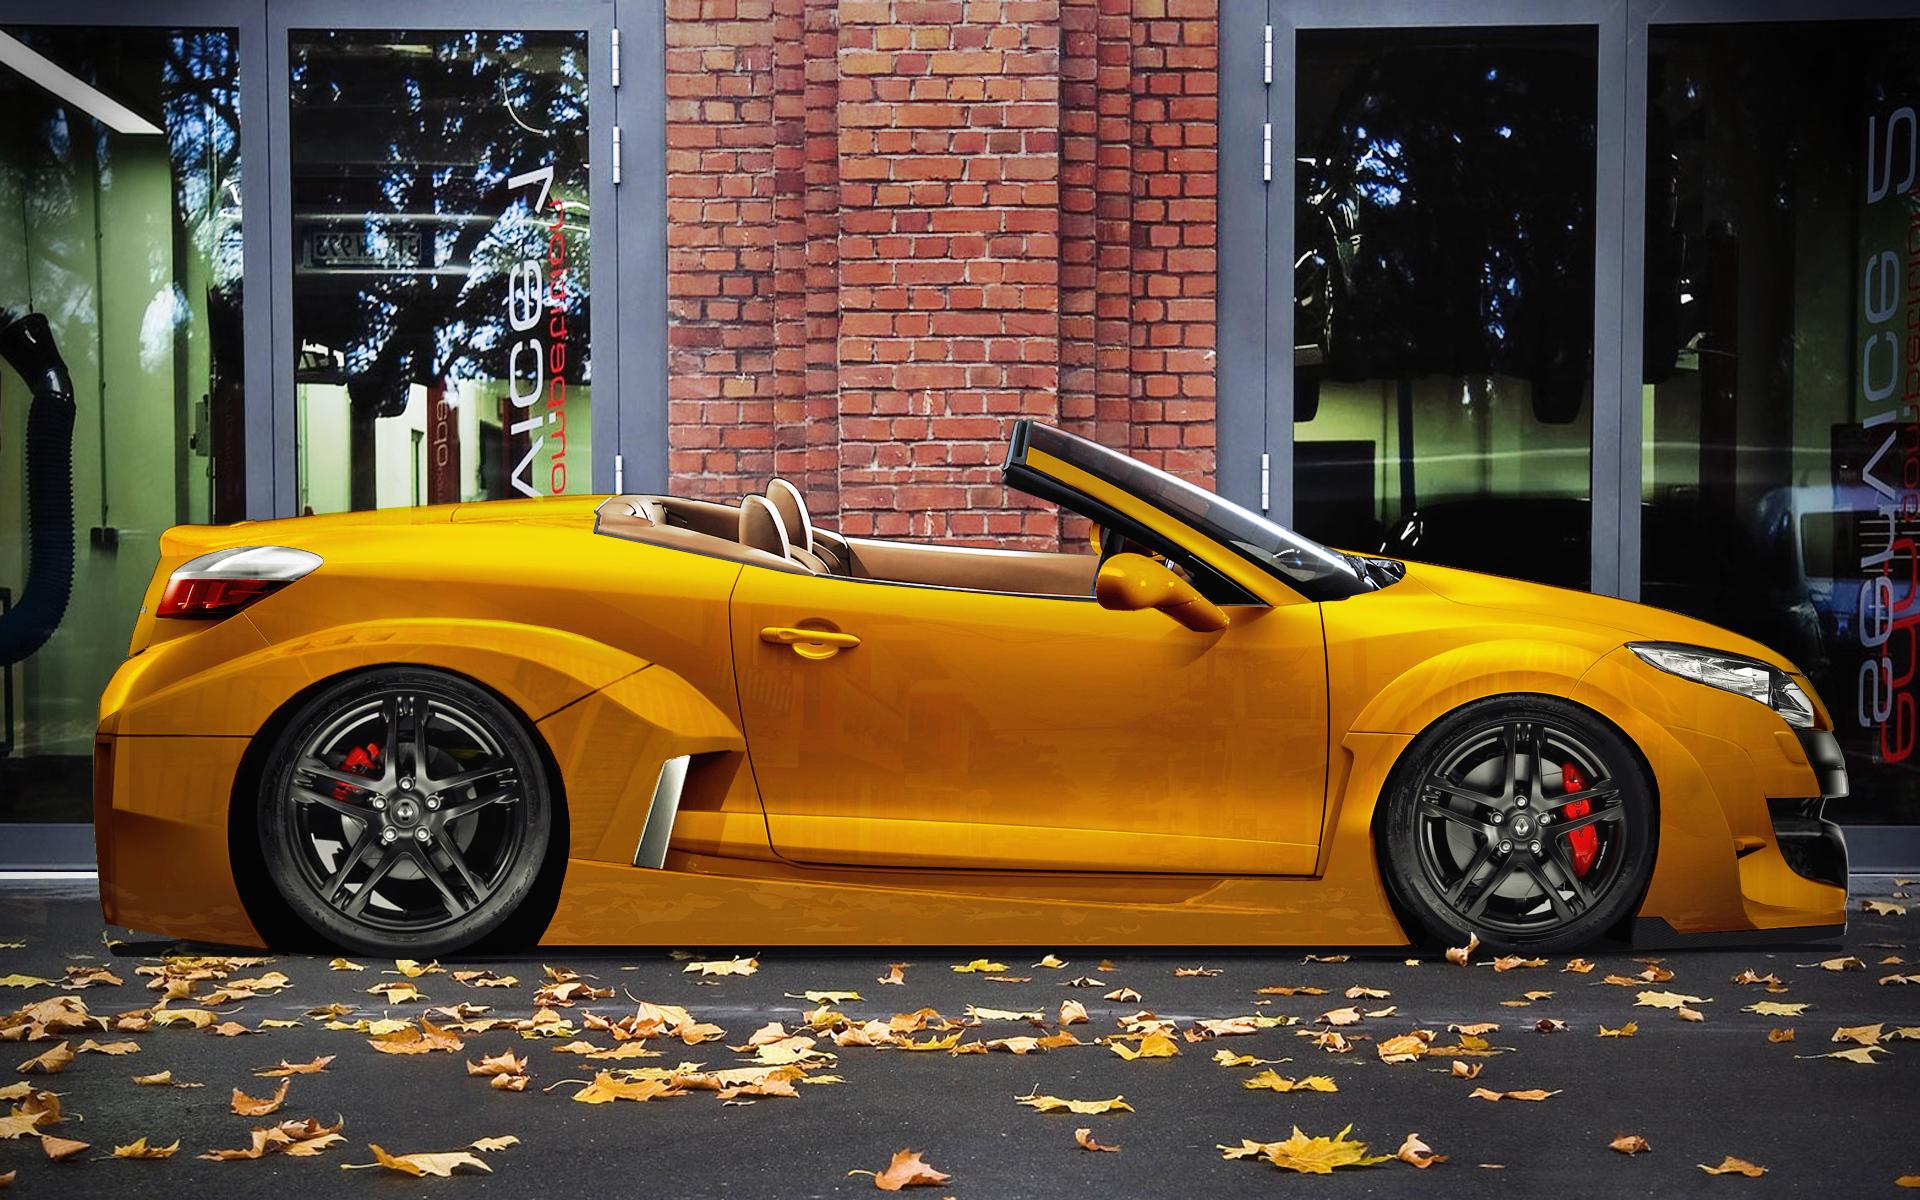 Renault Megane 3 Convertible